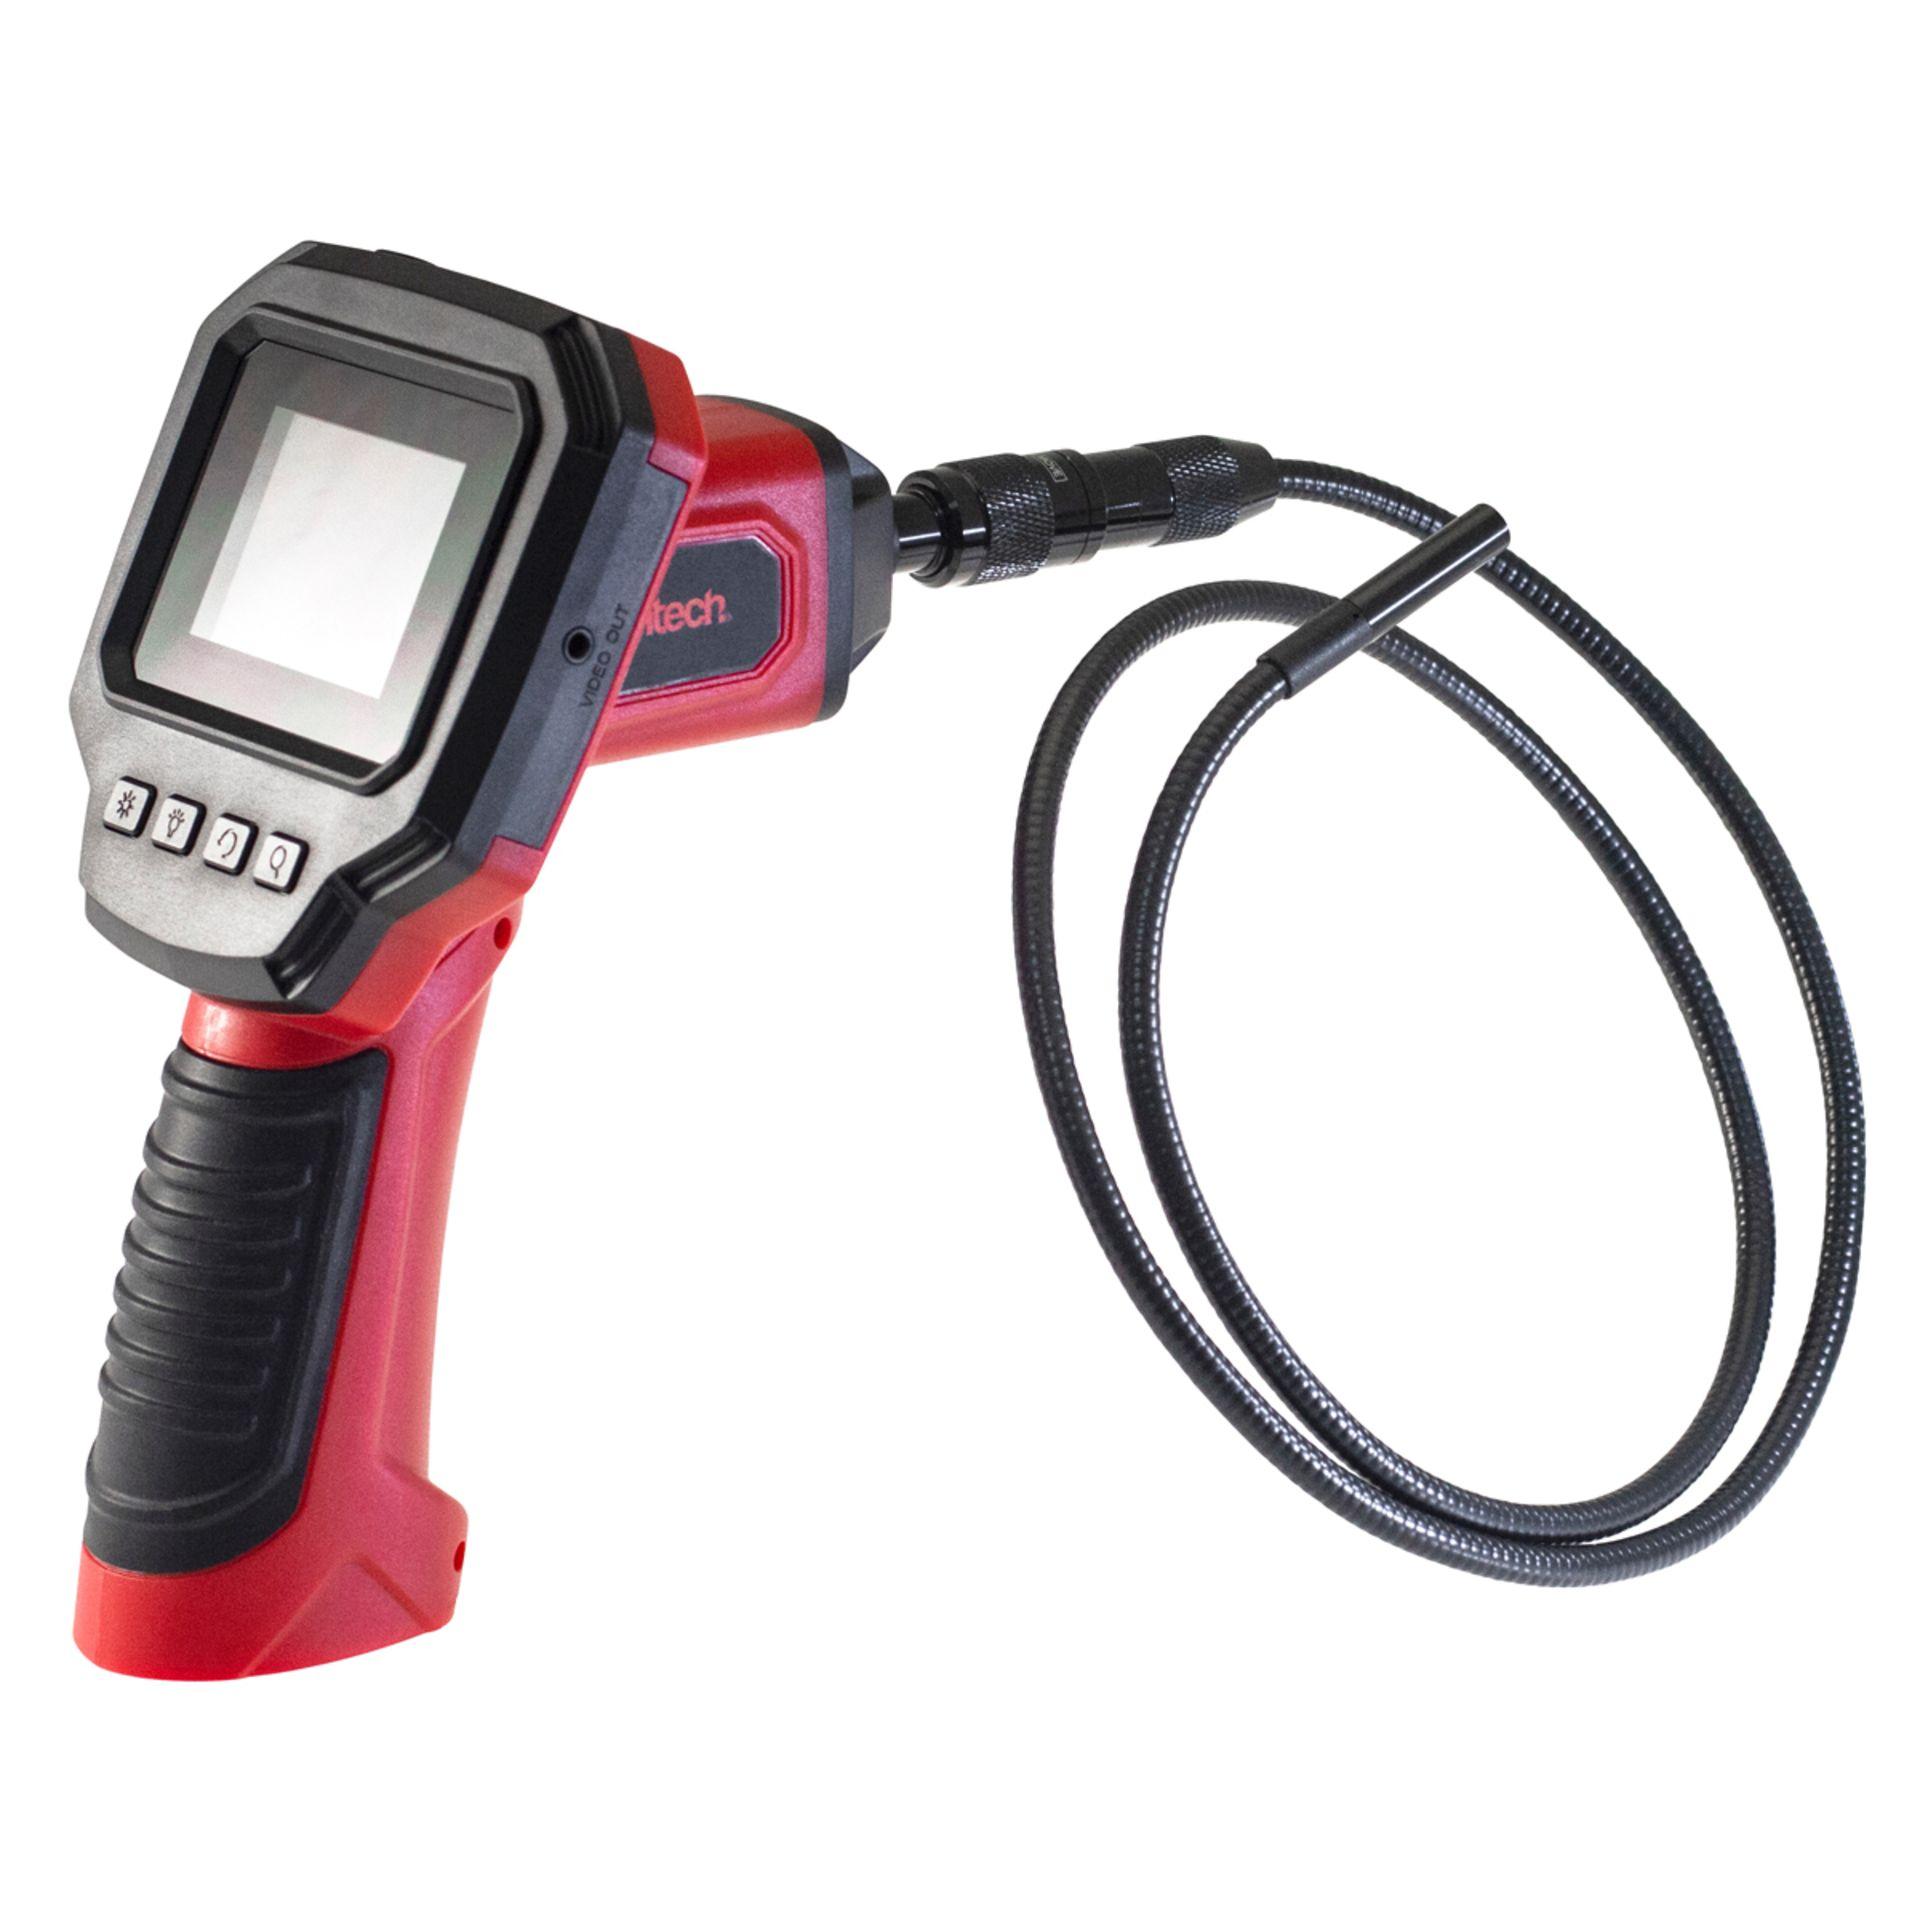 Lot 11455 - V Brand New 2.4 Inch Colour LCD Inspection Camera - Adjustable Backlit LED Screen